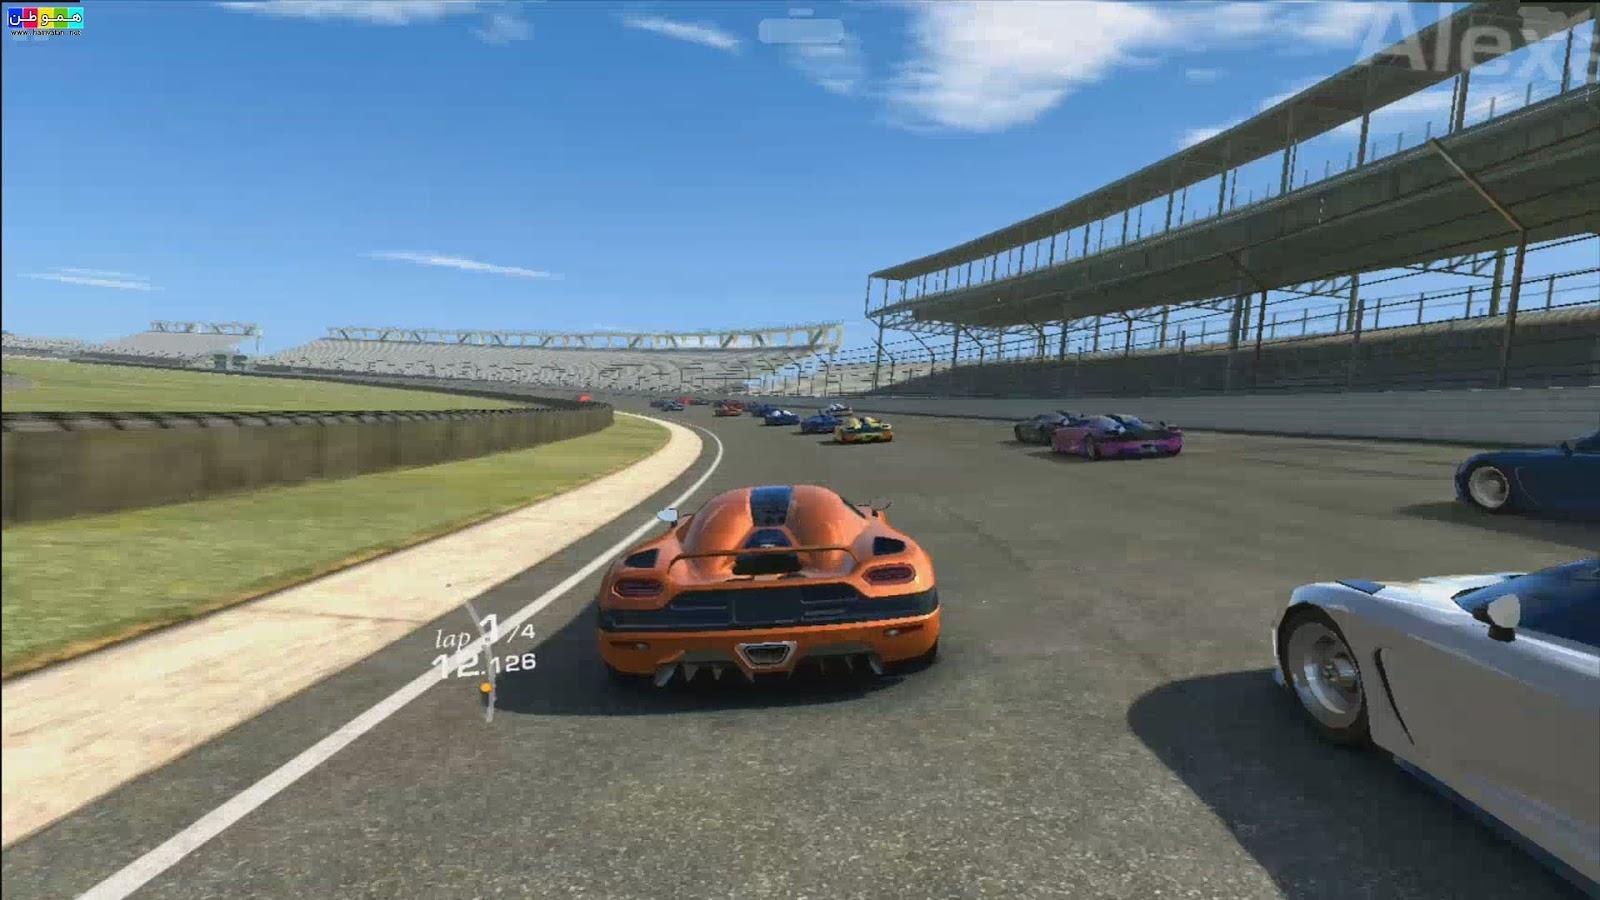 Download Real Racing 3 Unlimited Money Unlocked V6 6 1 Mod Apk For